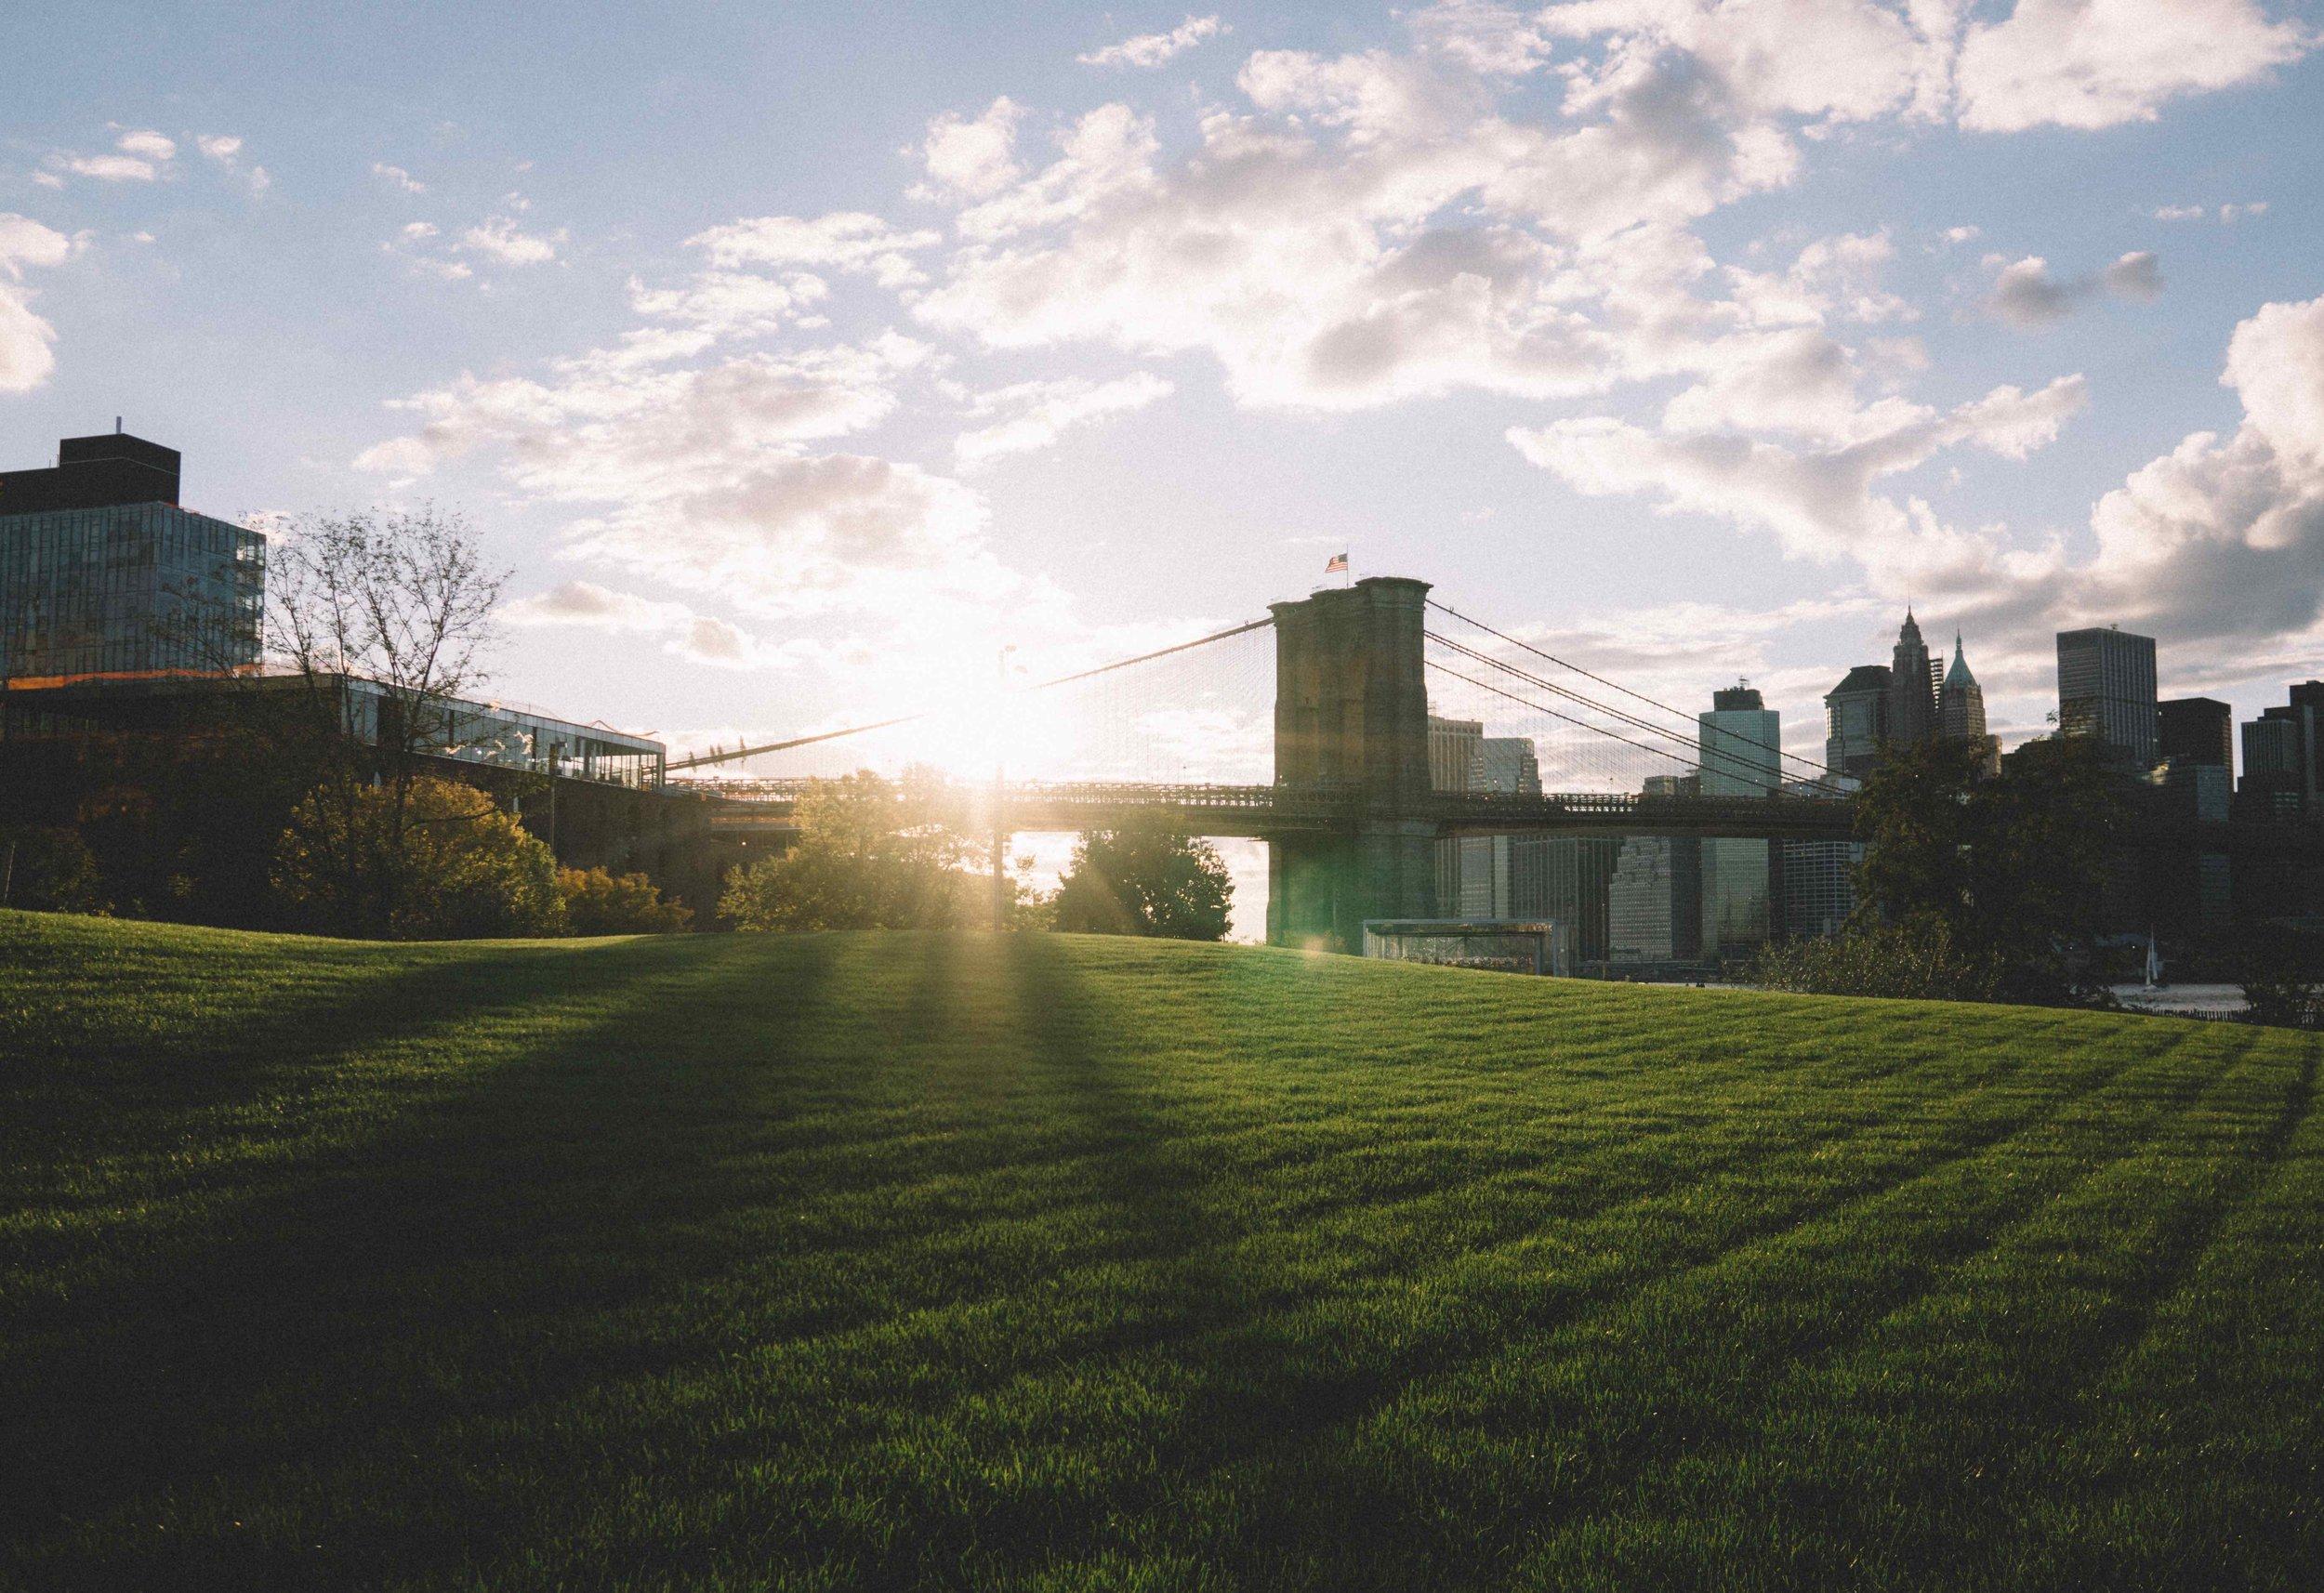 Dumbo Brooklyn Bridge NYC Travel Guide